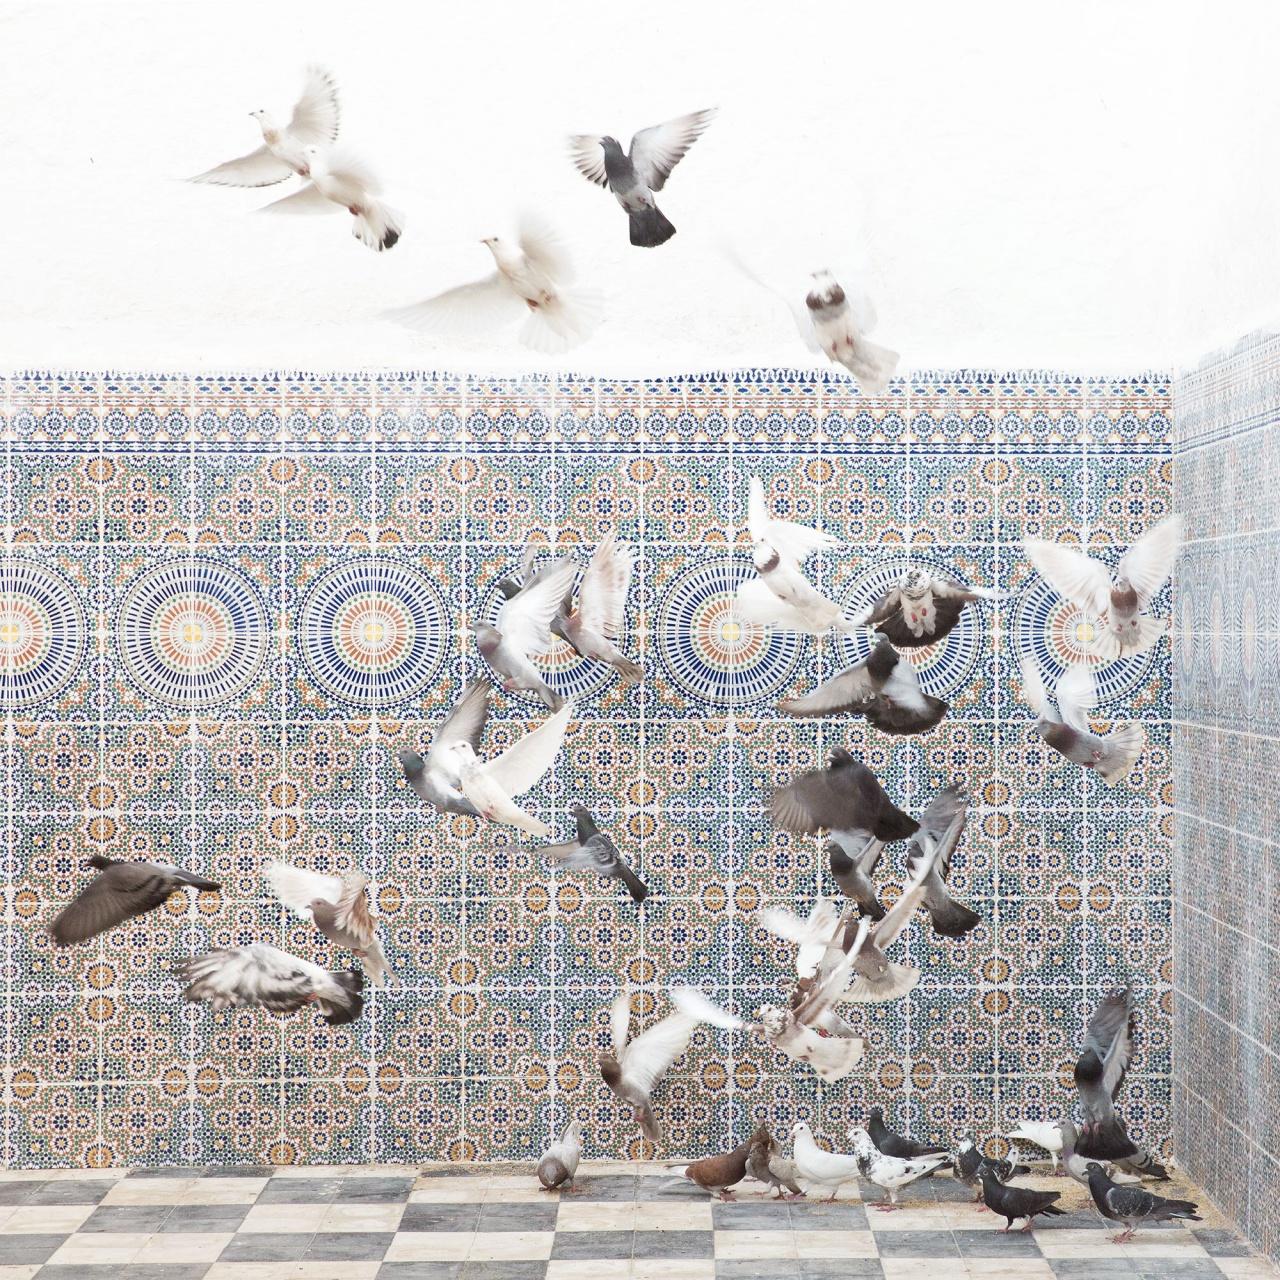 Marabout pigeons